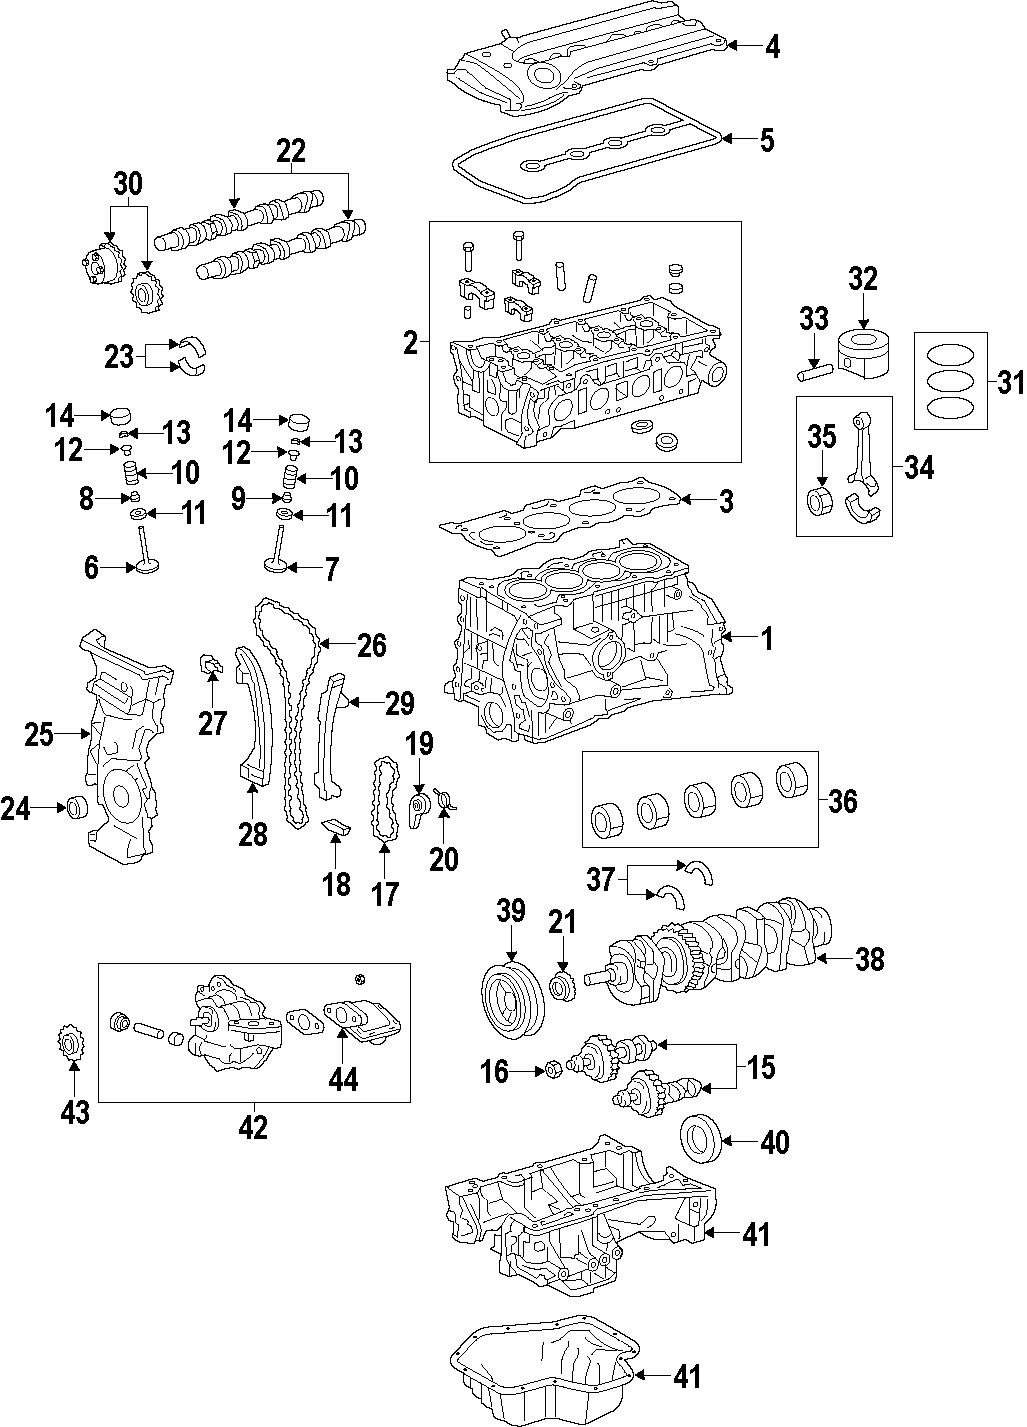 Toyota Corolla Engine Valve Stem Oil Seal. Scion; Toyota